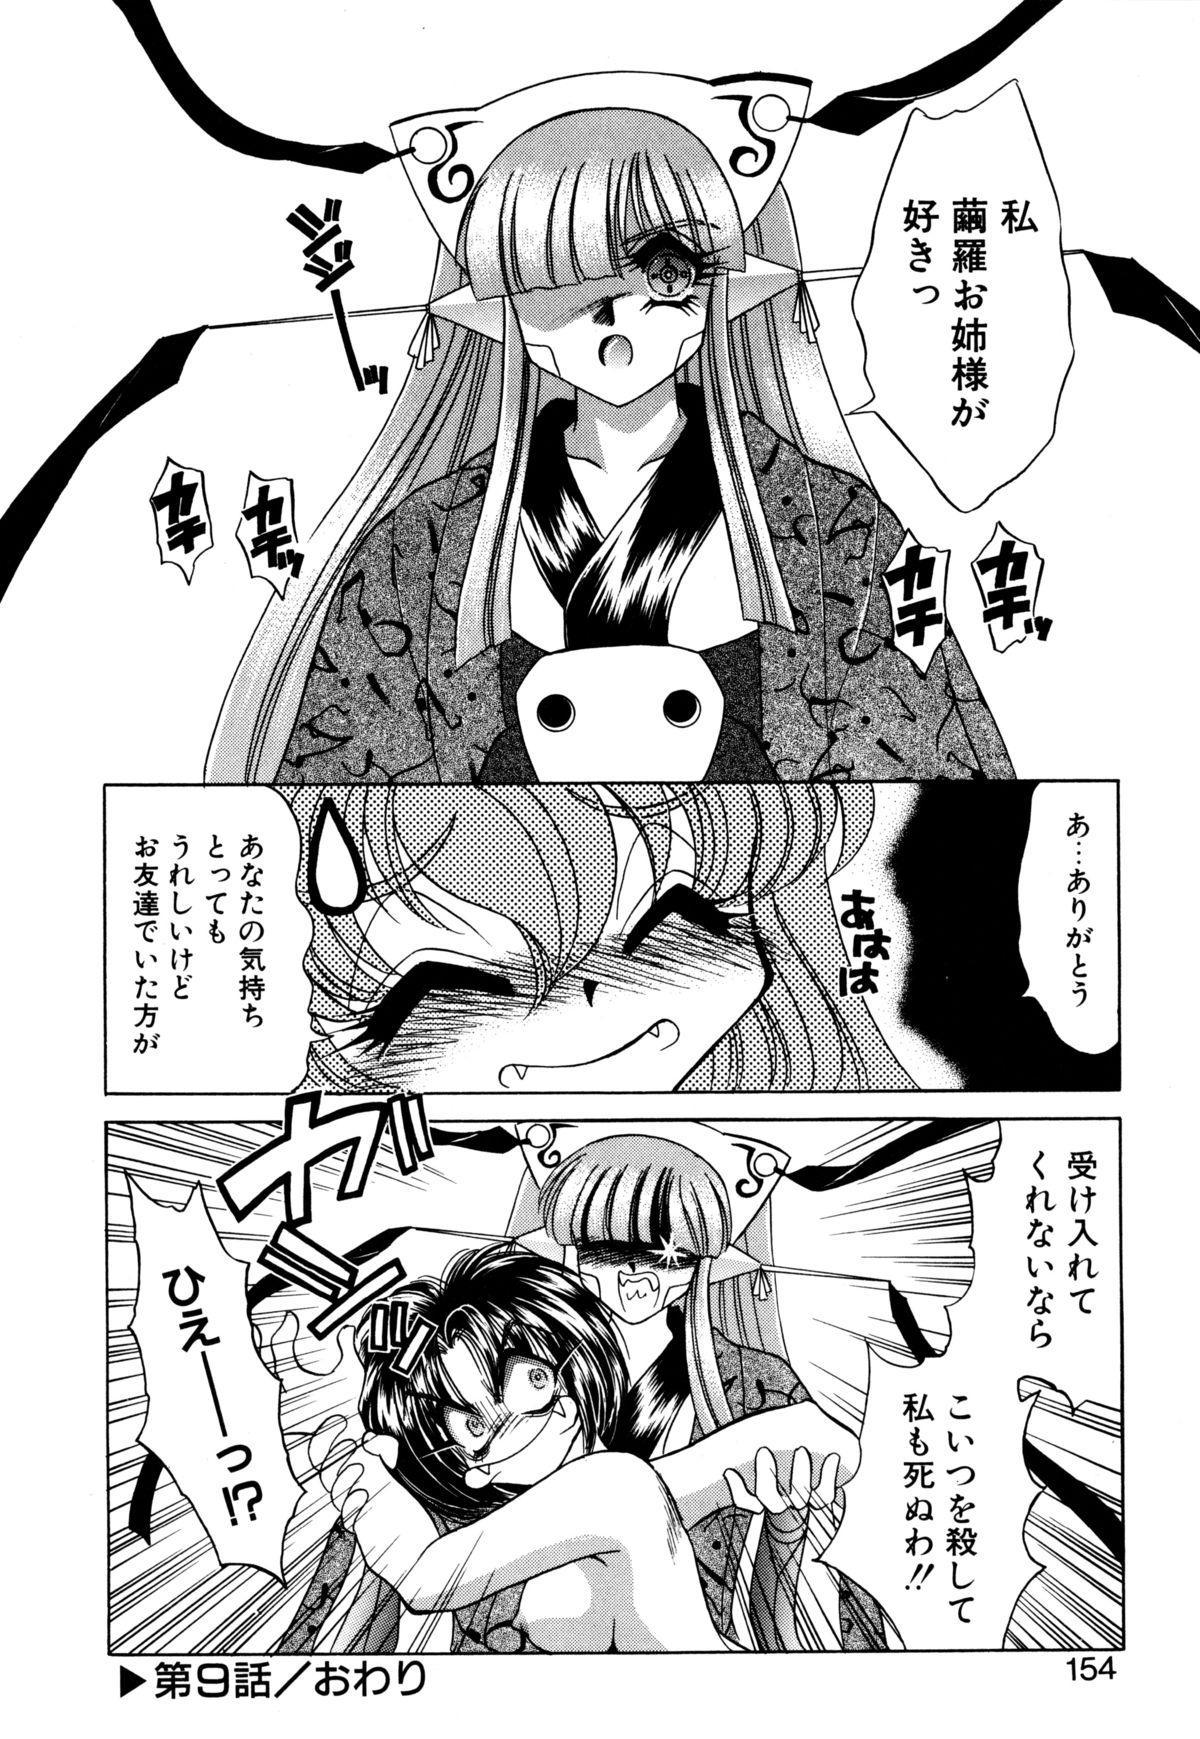 Kigurumi Sentai Quiltian 152